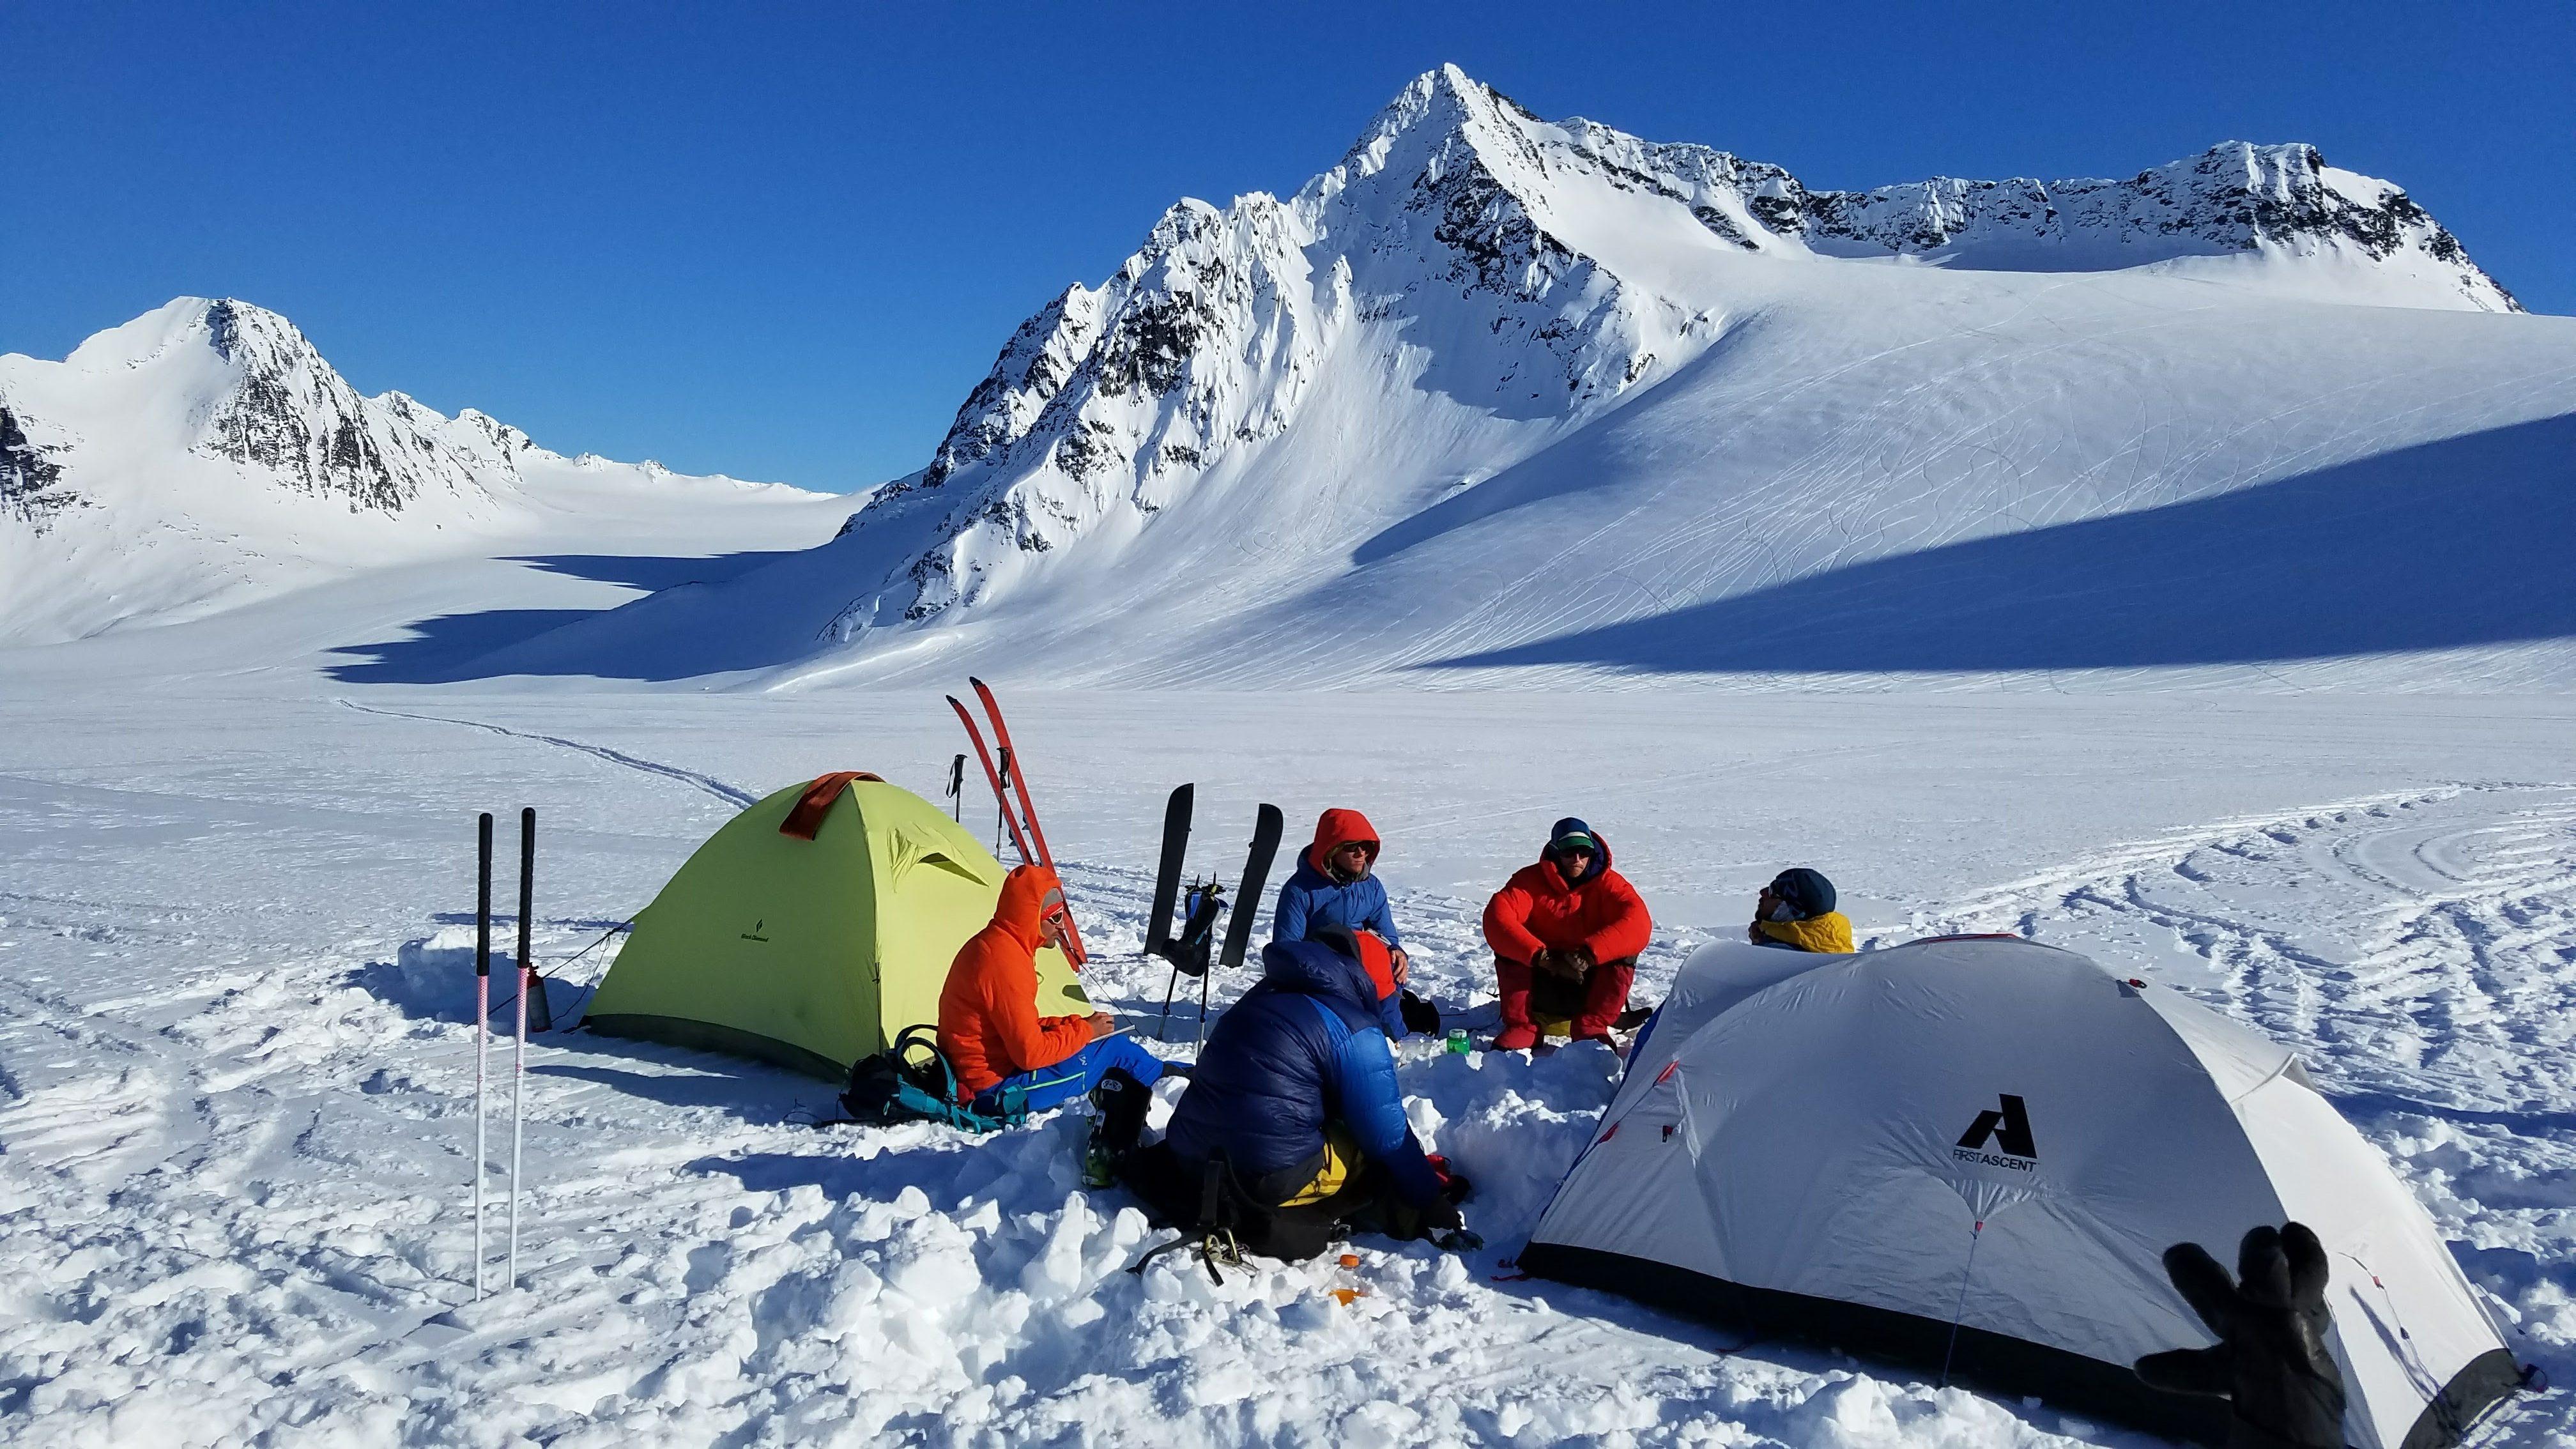 camp-1-tonsina-glacier-soucy-aaron-robert-jon-ray